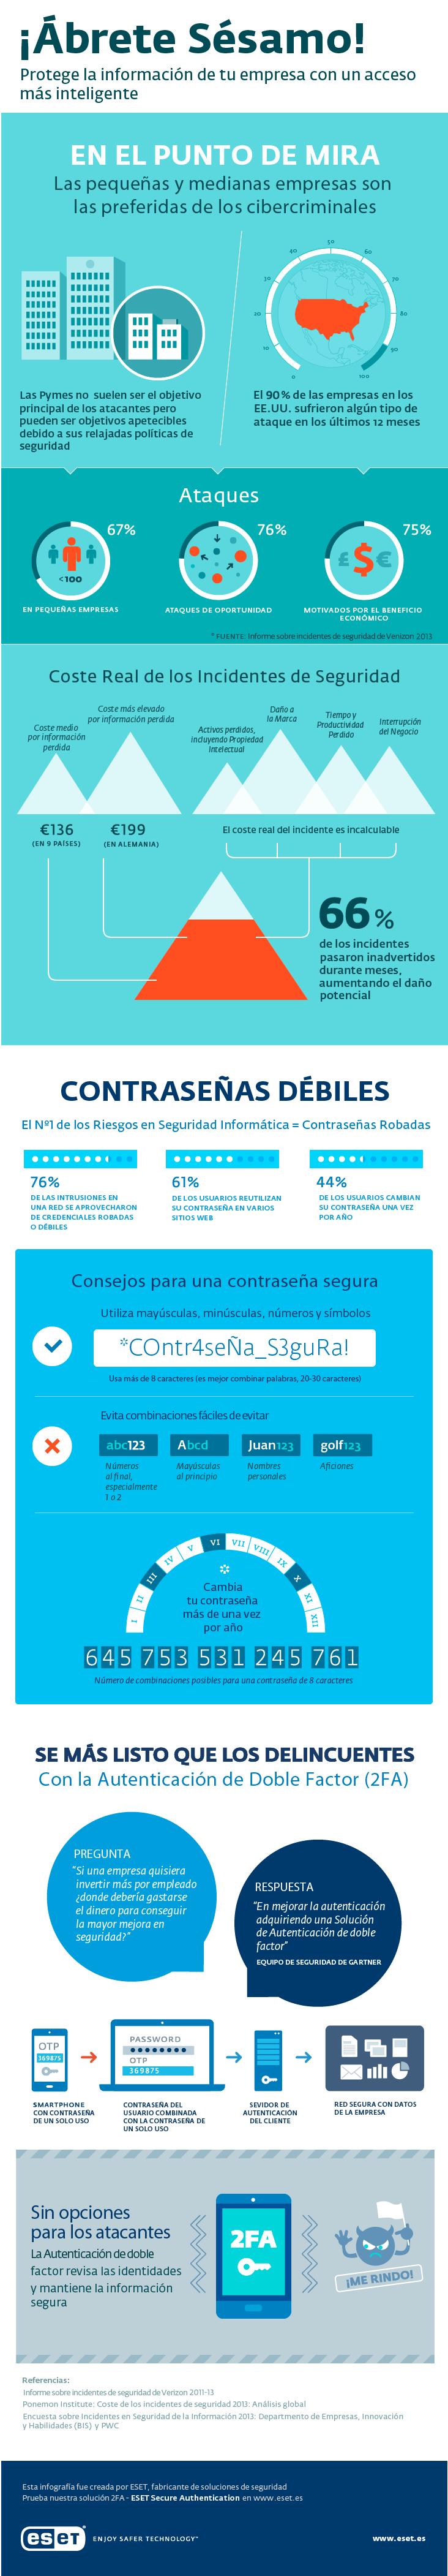 ESA2_Infographic_Source español